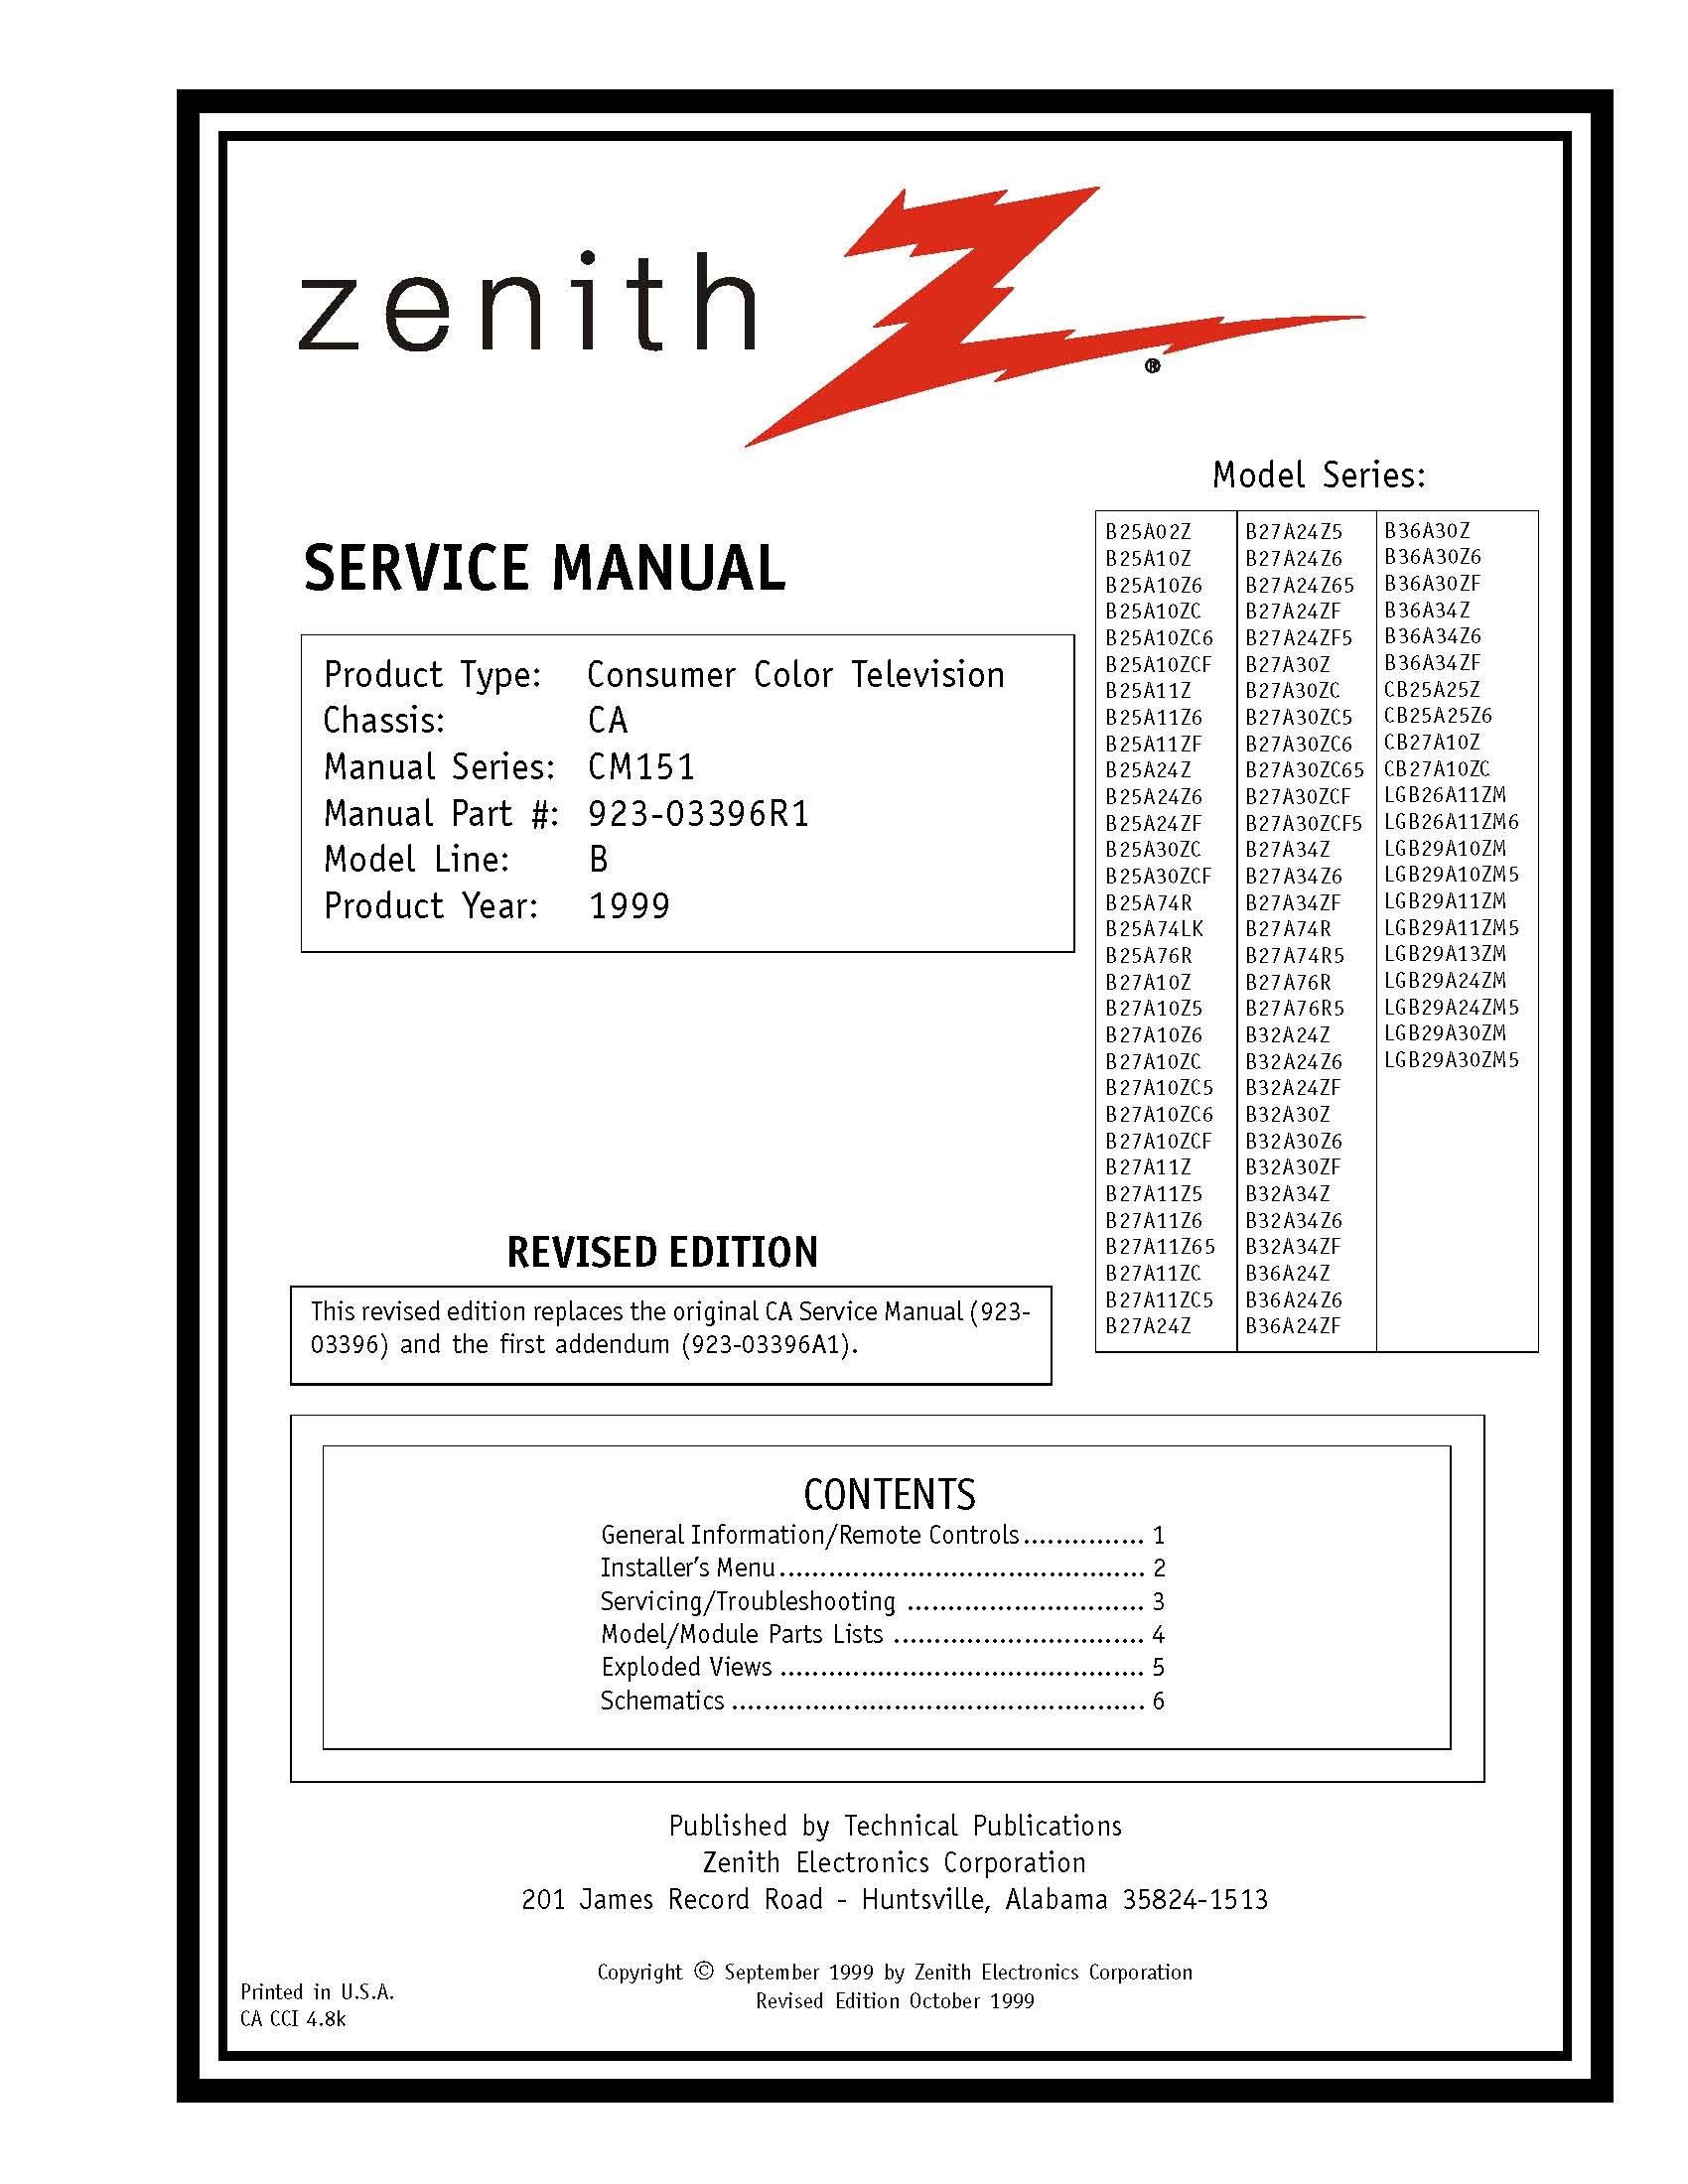 b25a02z b25a10z b25a10z6 b25a10zc service manual zenith amazon com rh amazon com Zenith Tube Radio Schematics Zenith Radio Service Manual